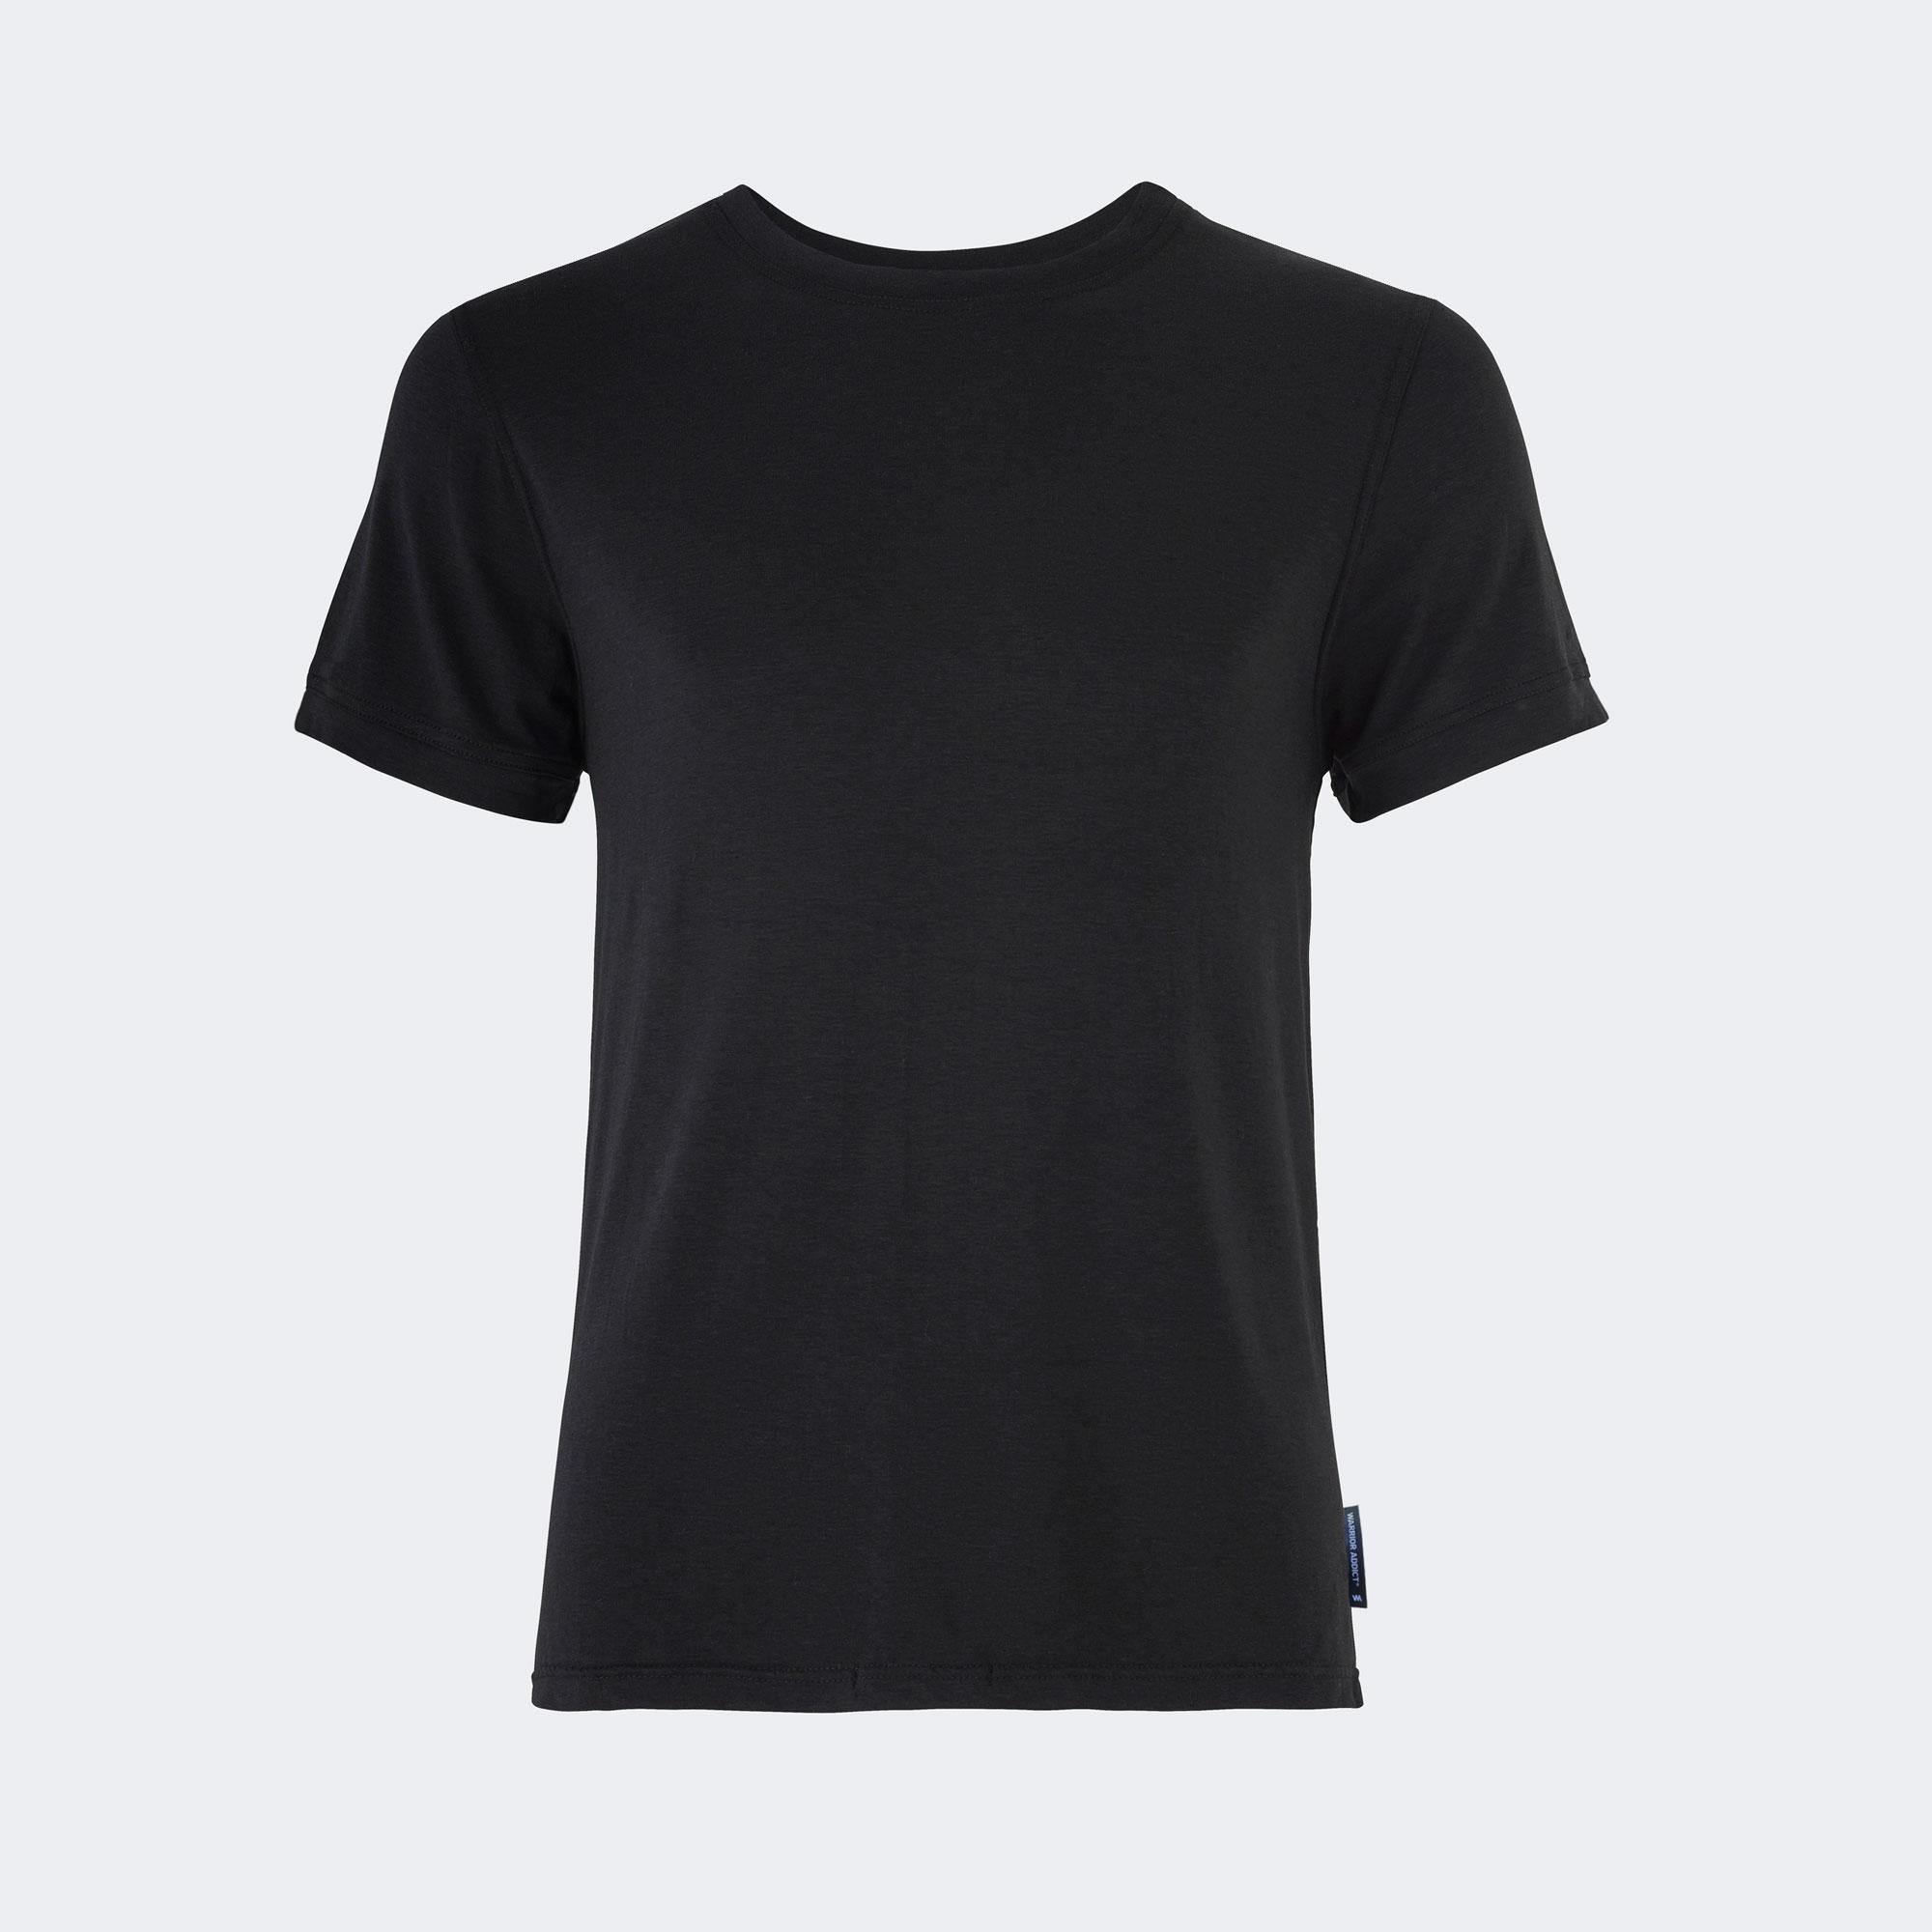 Warrior addict black mens yoga performance t-shirt front view